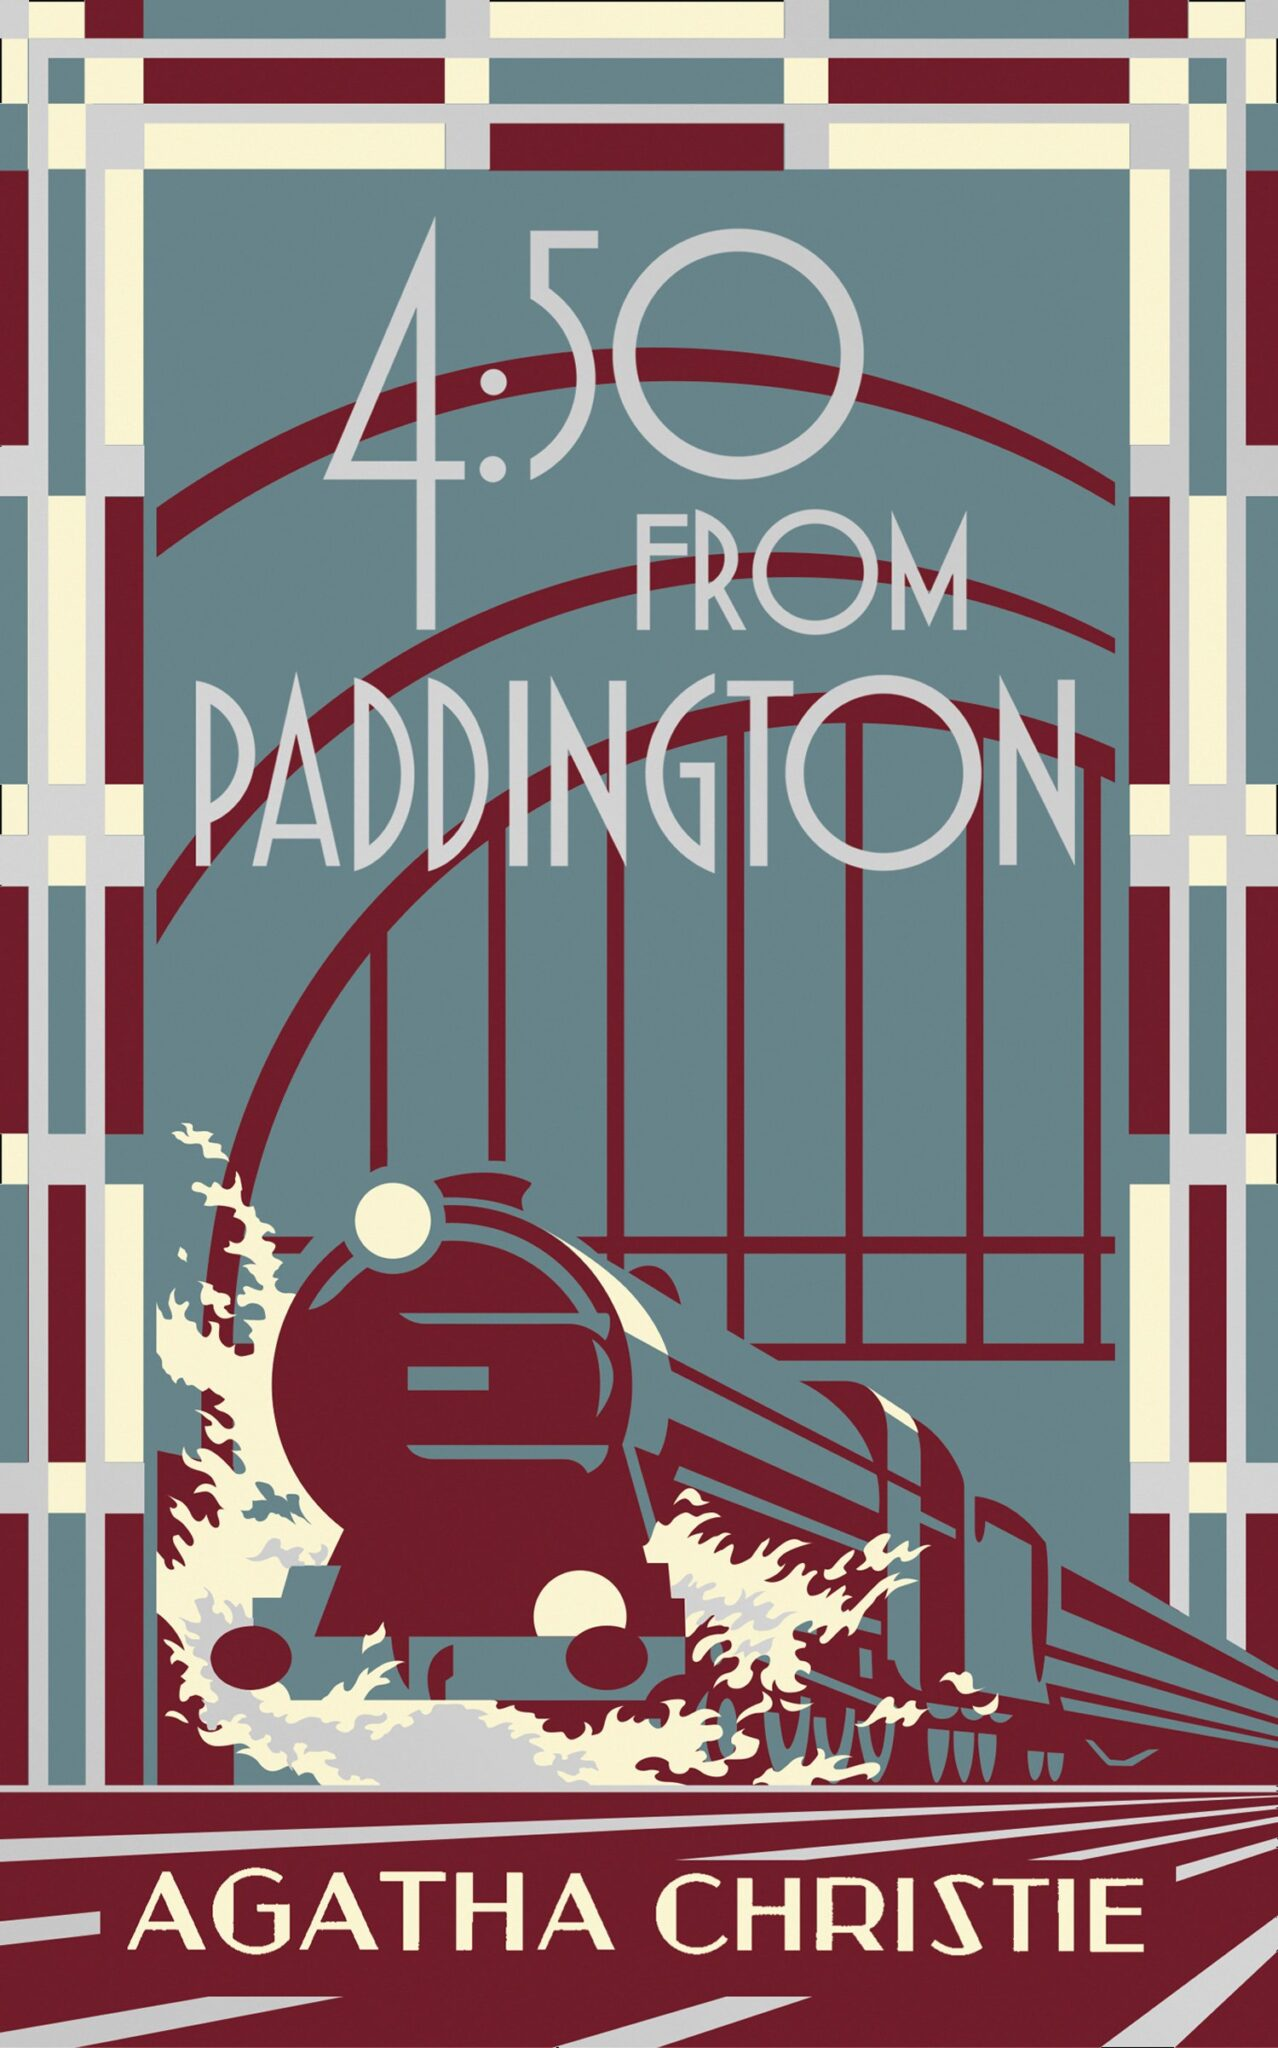 agatha christie se 450 from paddington cover